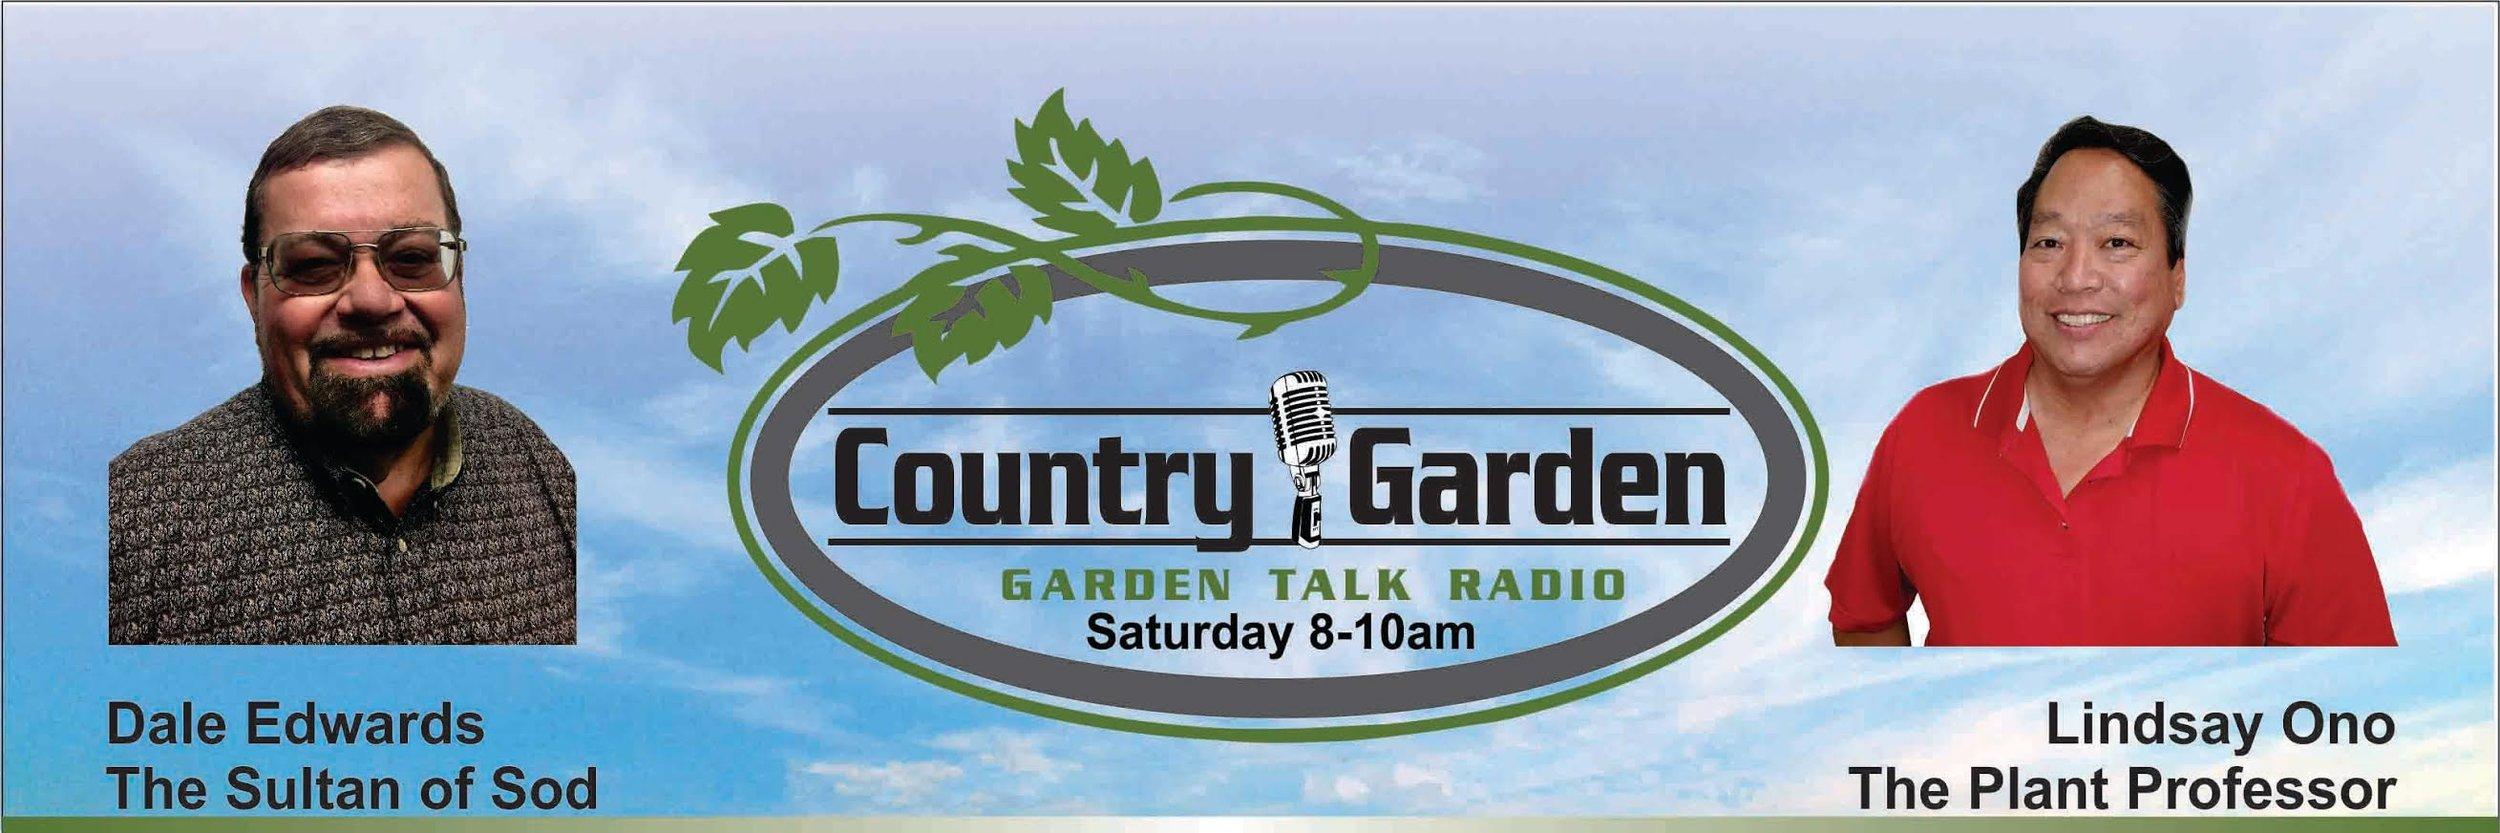 country-garden-radio.jpg